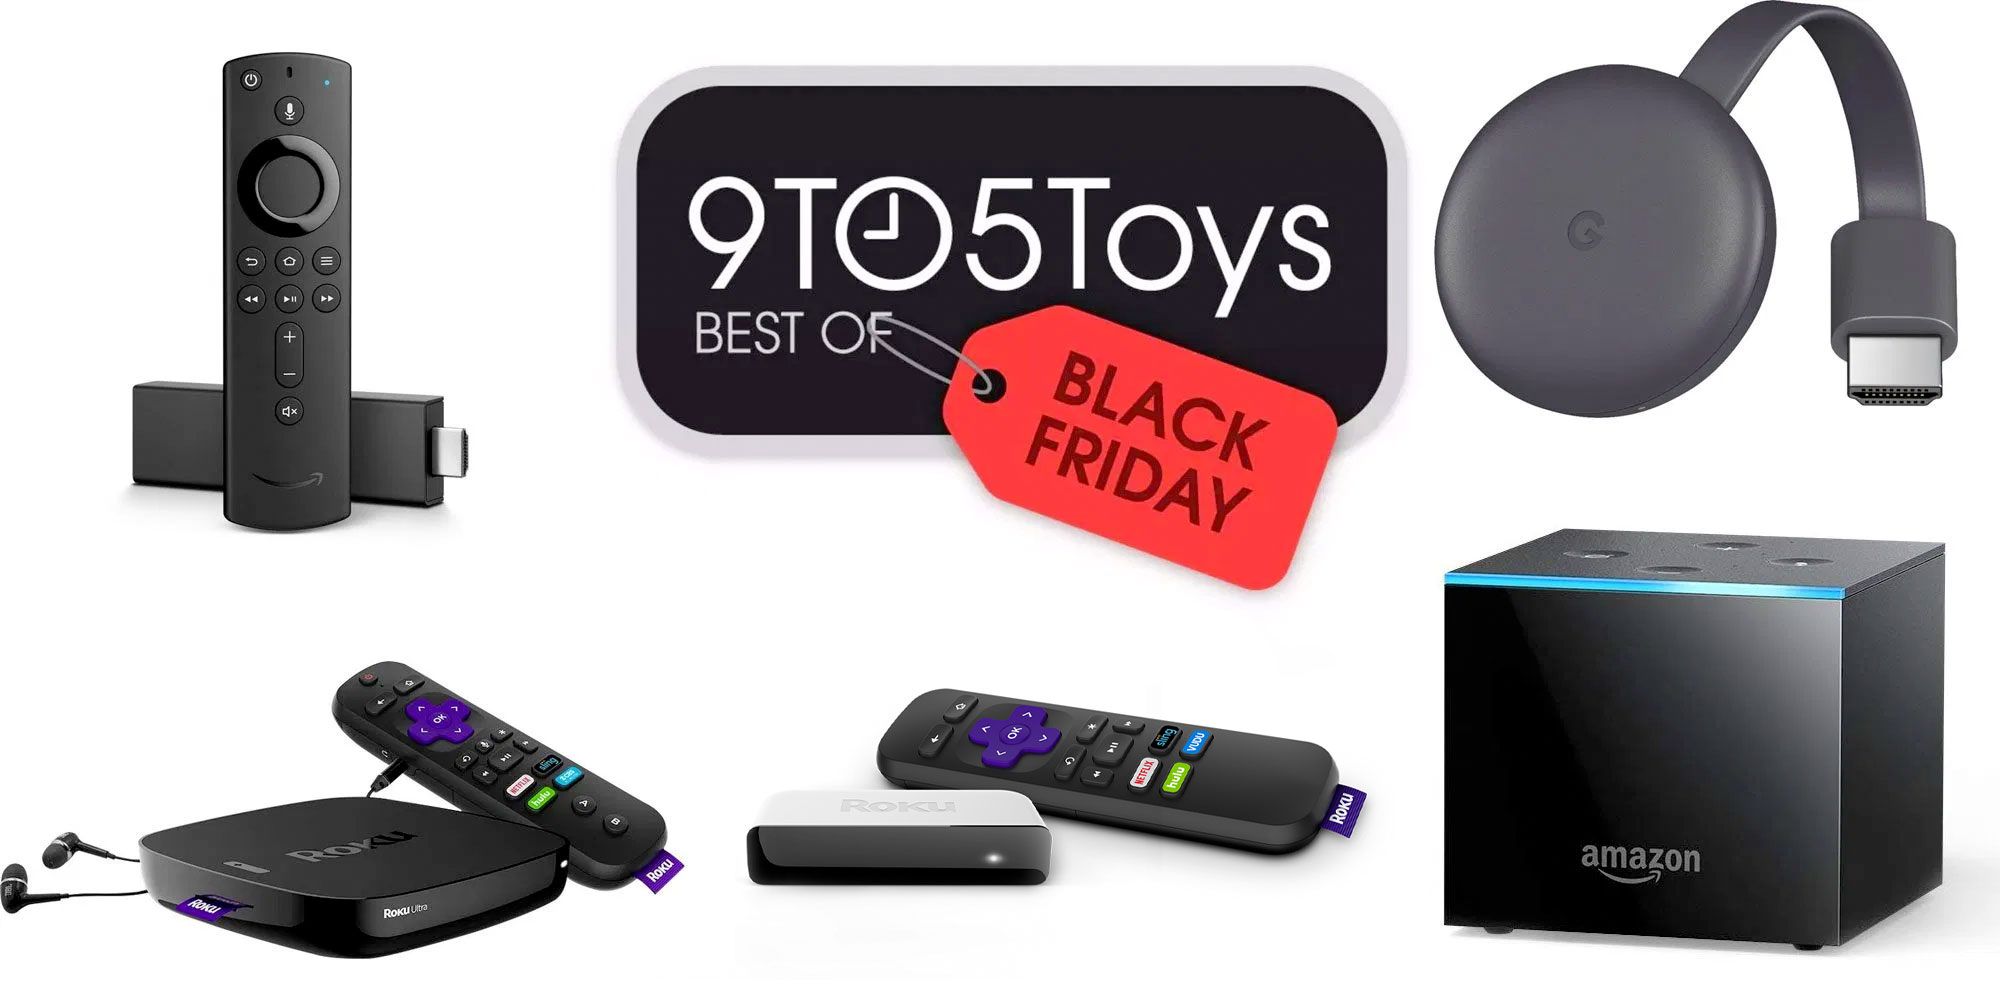 Best of Black Friday 2019 – Streaming Media Players: $20 Fire TV, $35 Chromecast bundle, more